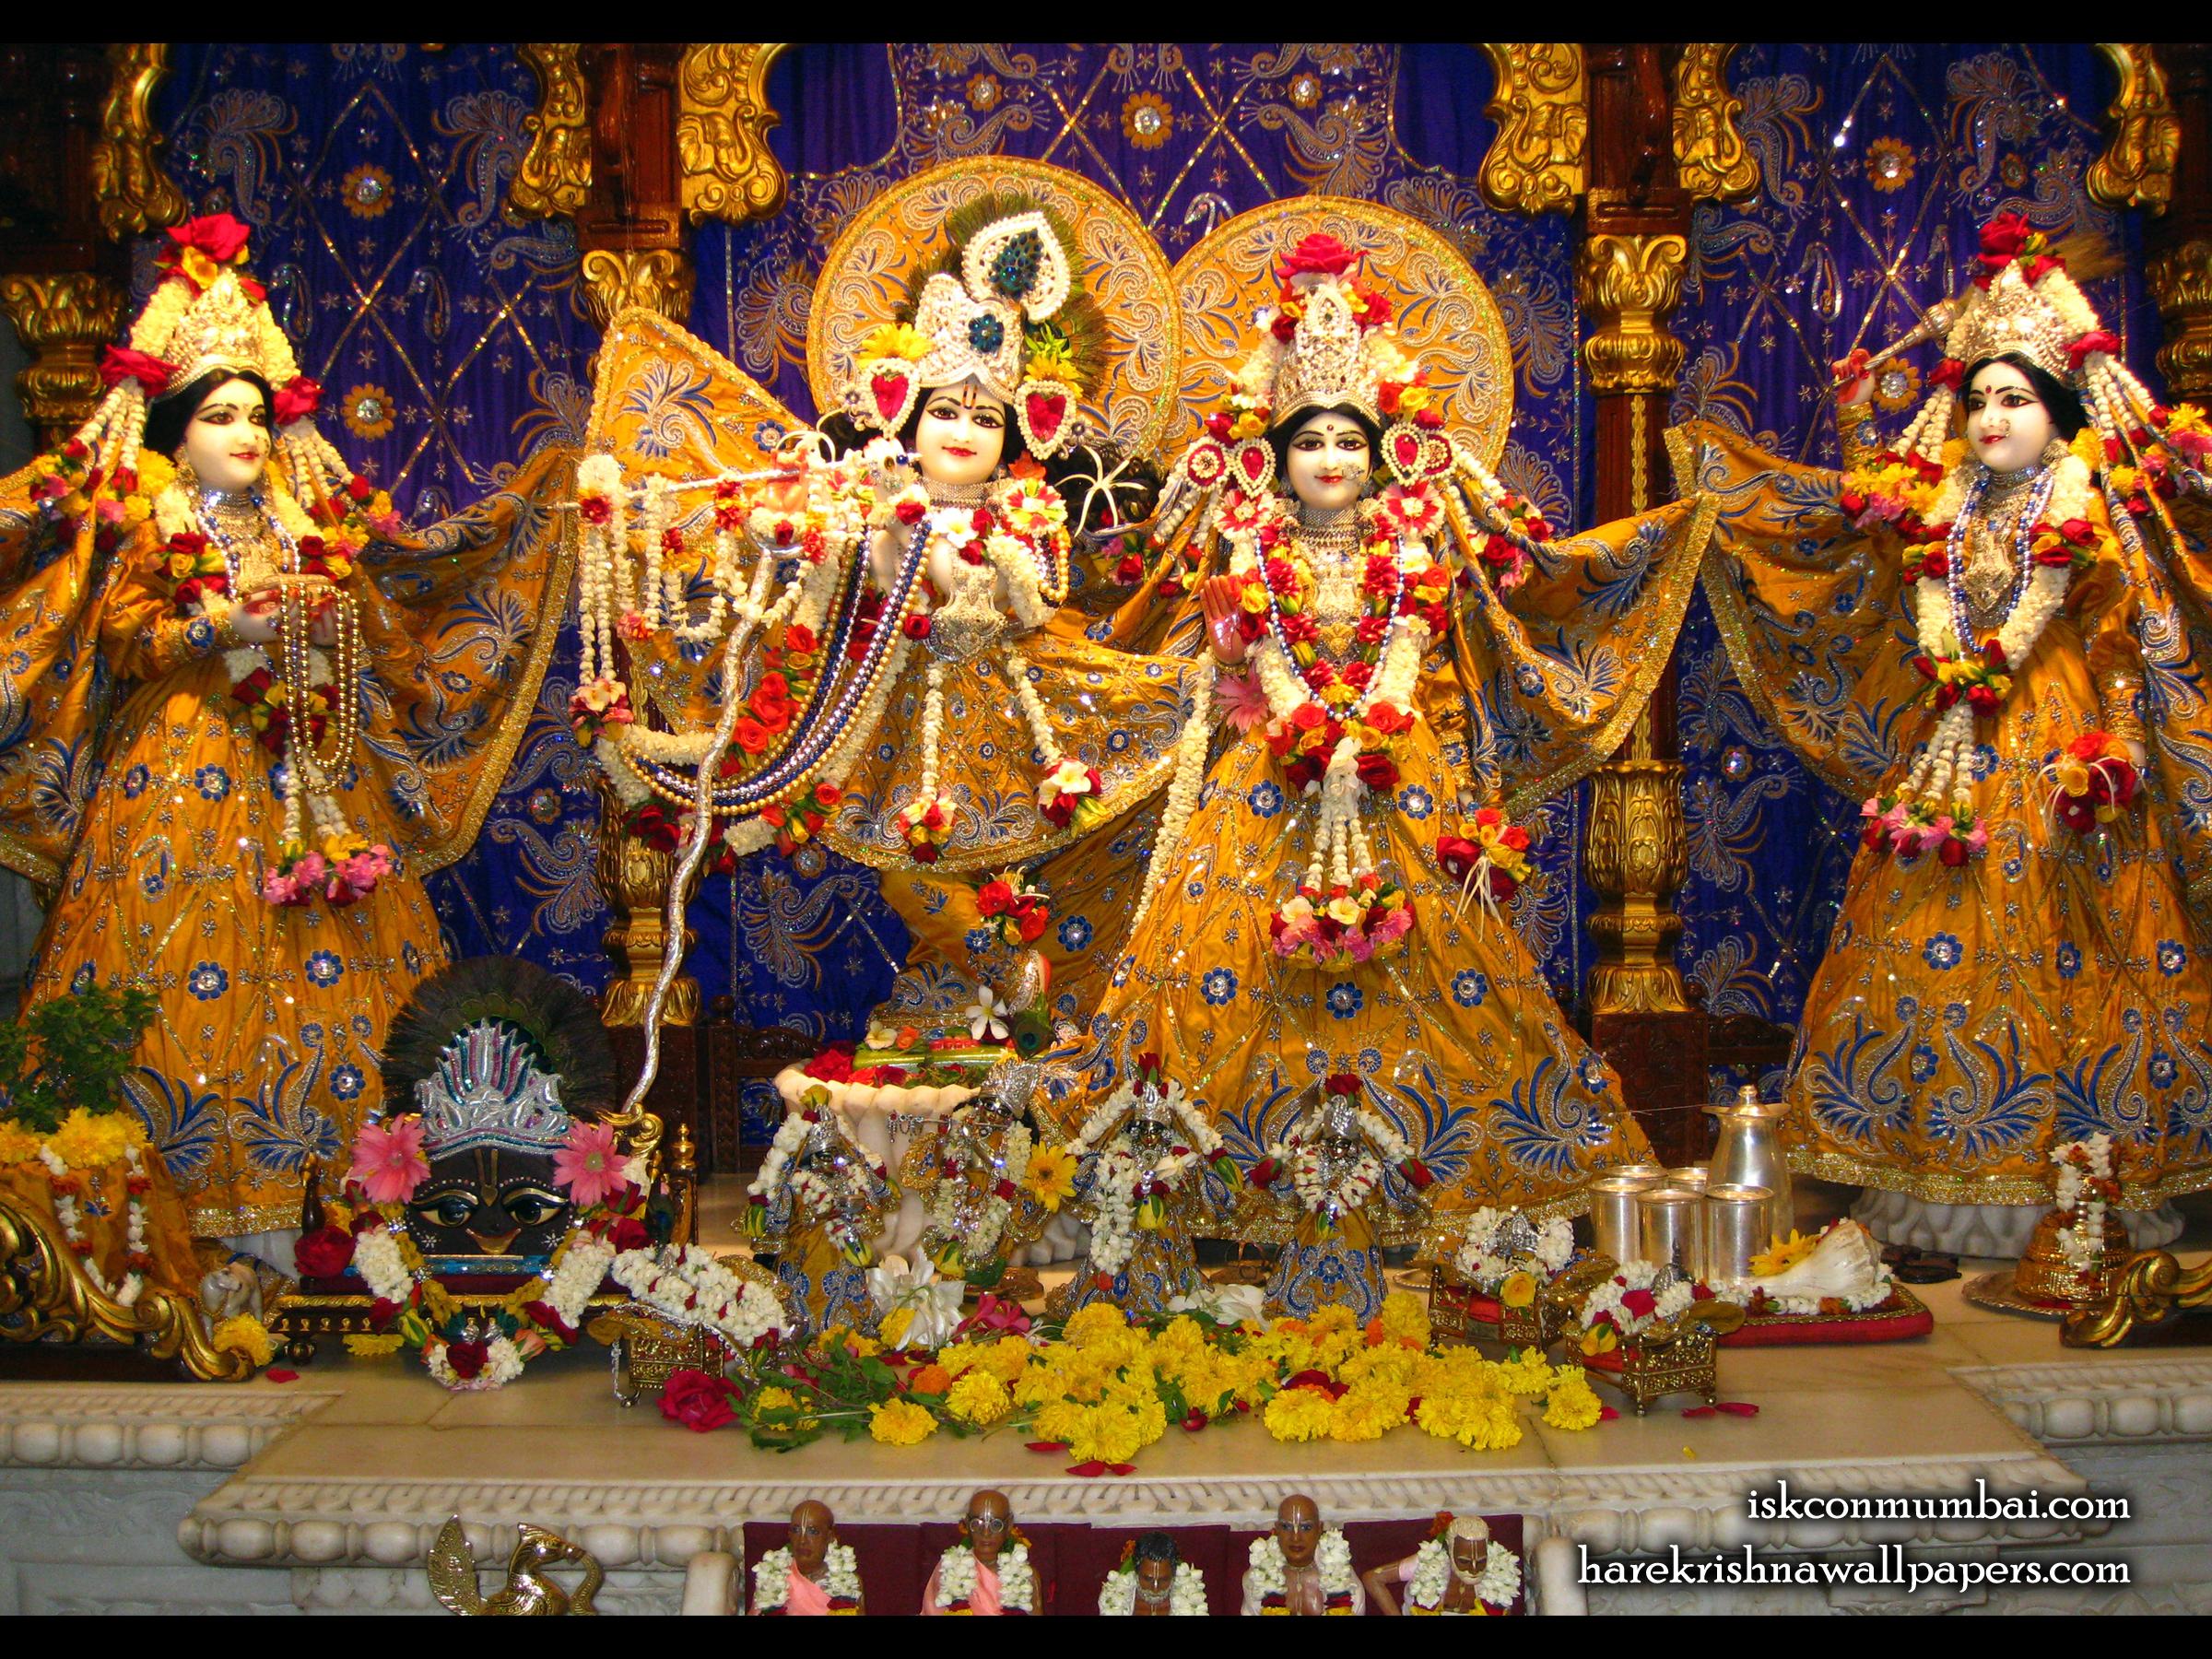 Sri Sri Radha Rasabihari Lalita Vishakha Wallpaper (005) Size 2400x1800 Download